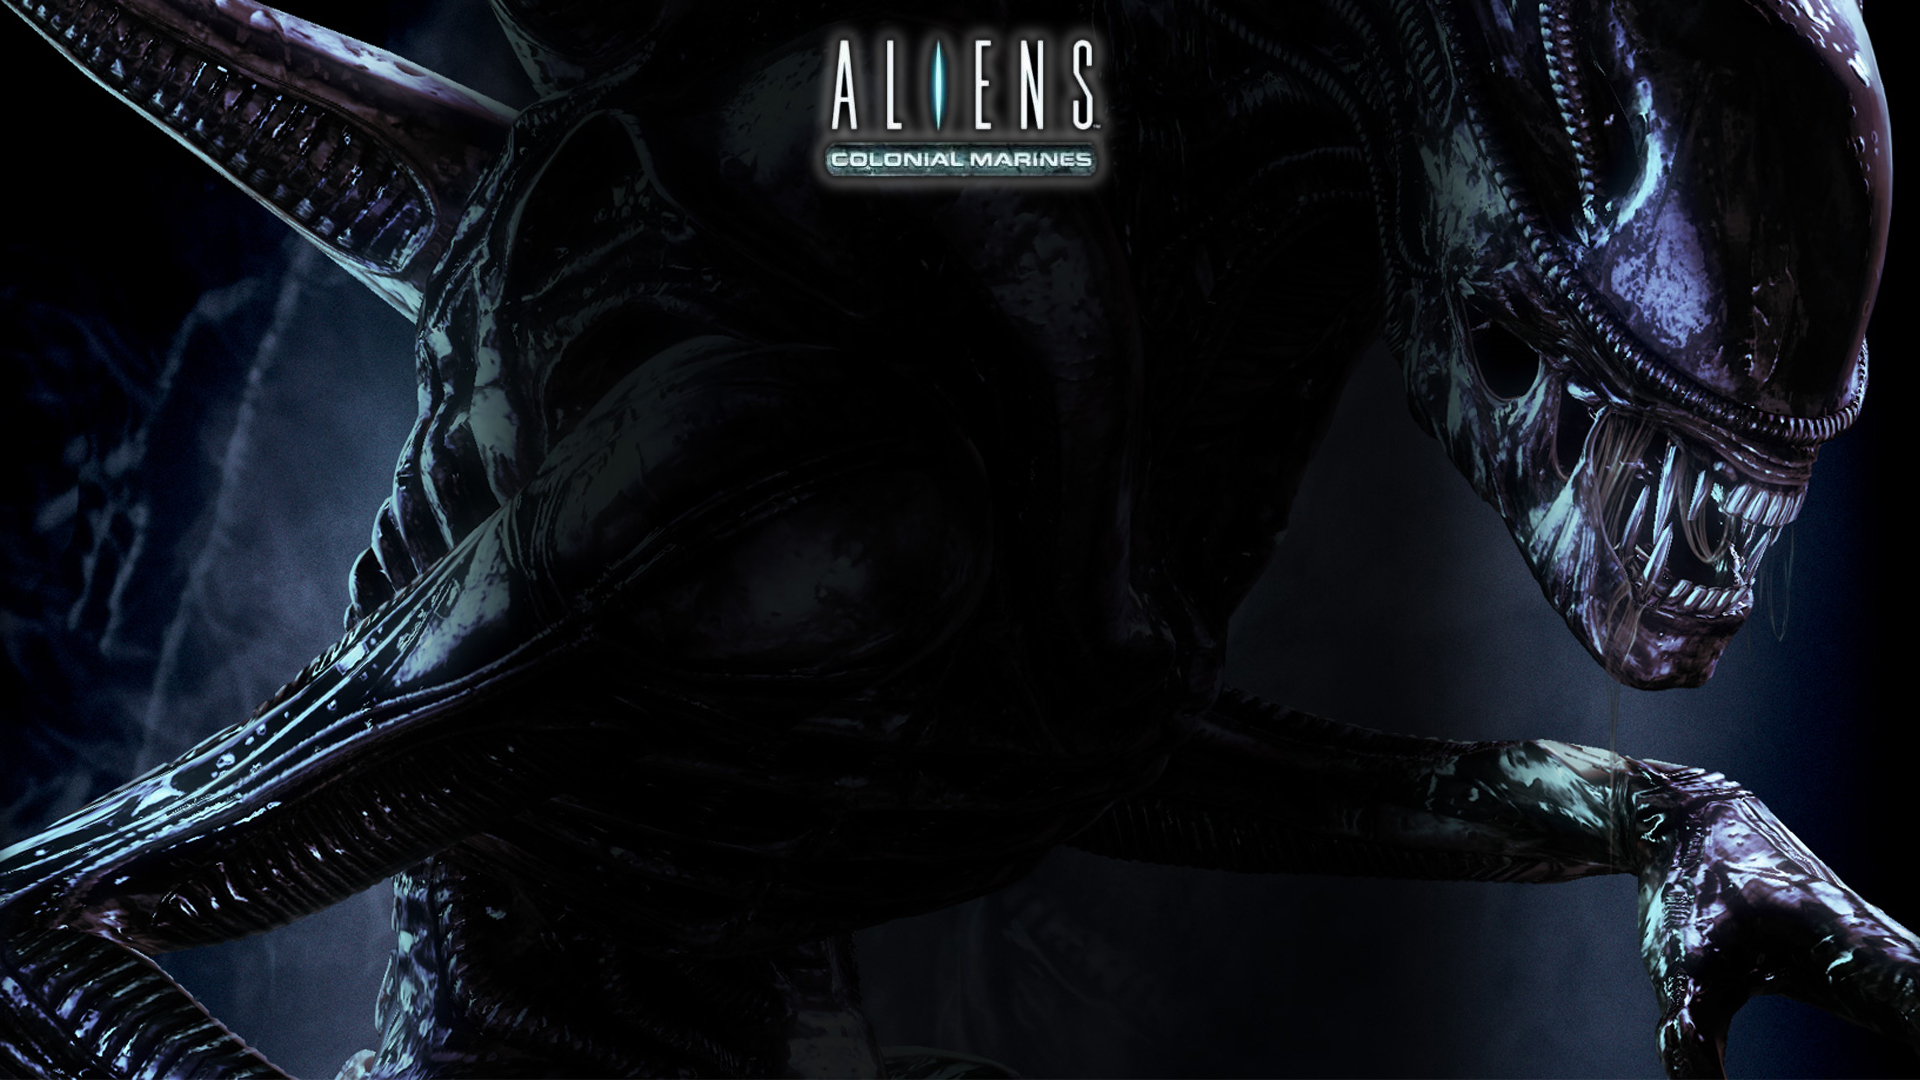 Aliens Movie Wallpaper 1920x1080